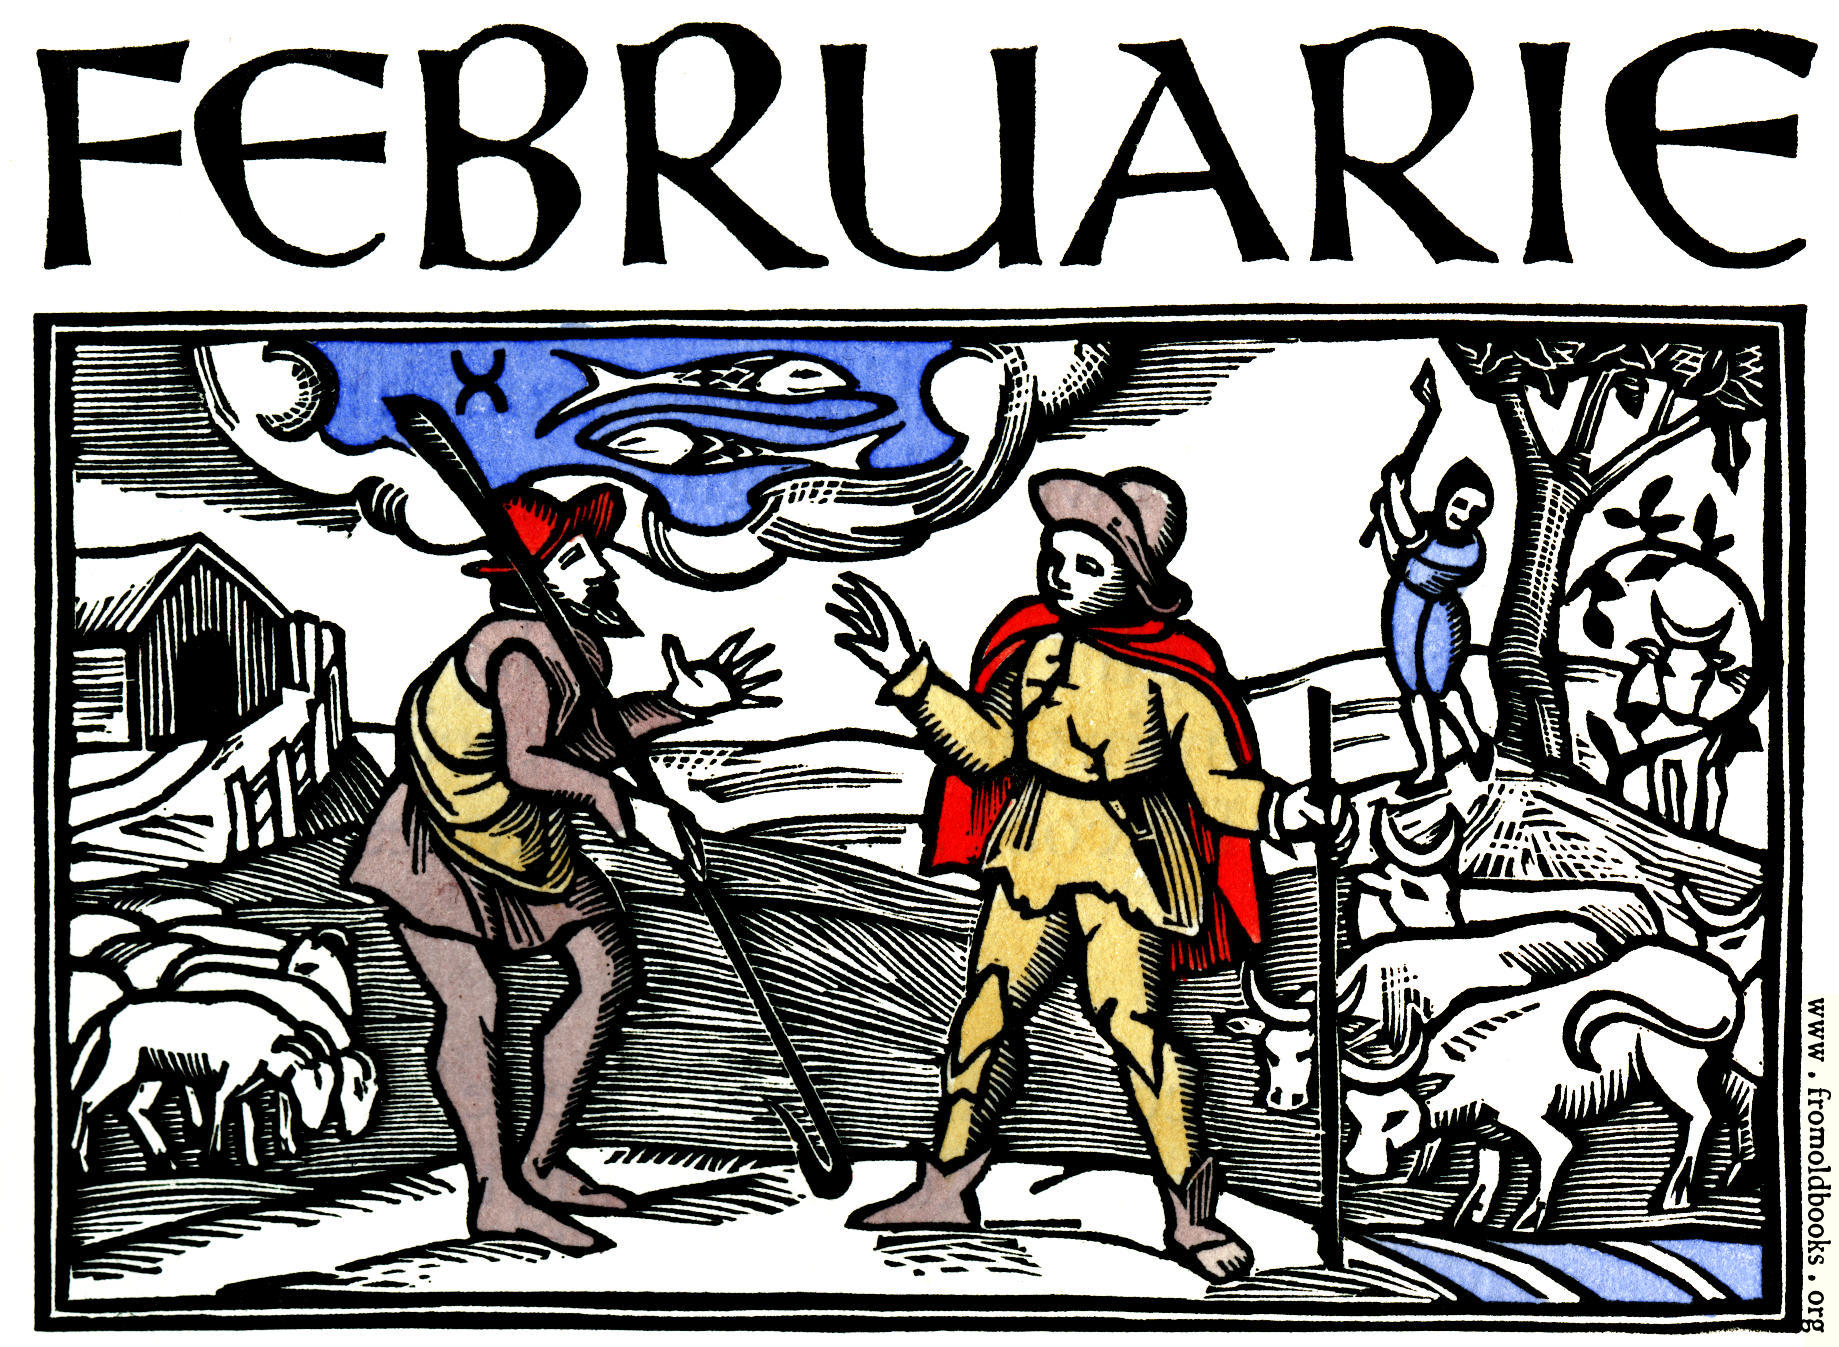 https://i0.wp.com/www.fromoldbooks.org/Renwick-Spenser/pages/Calendar-02-February/Calendar-02-February-q75-1839x1347.jpg